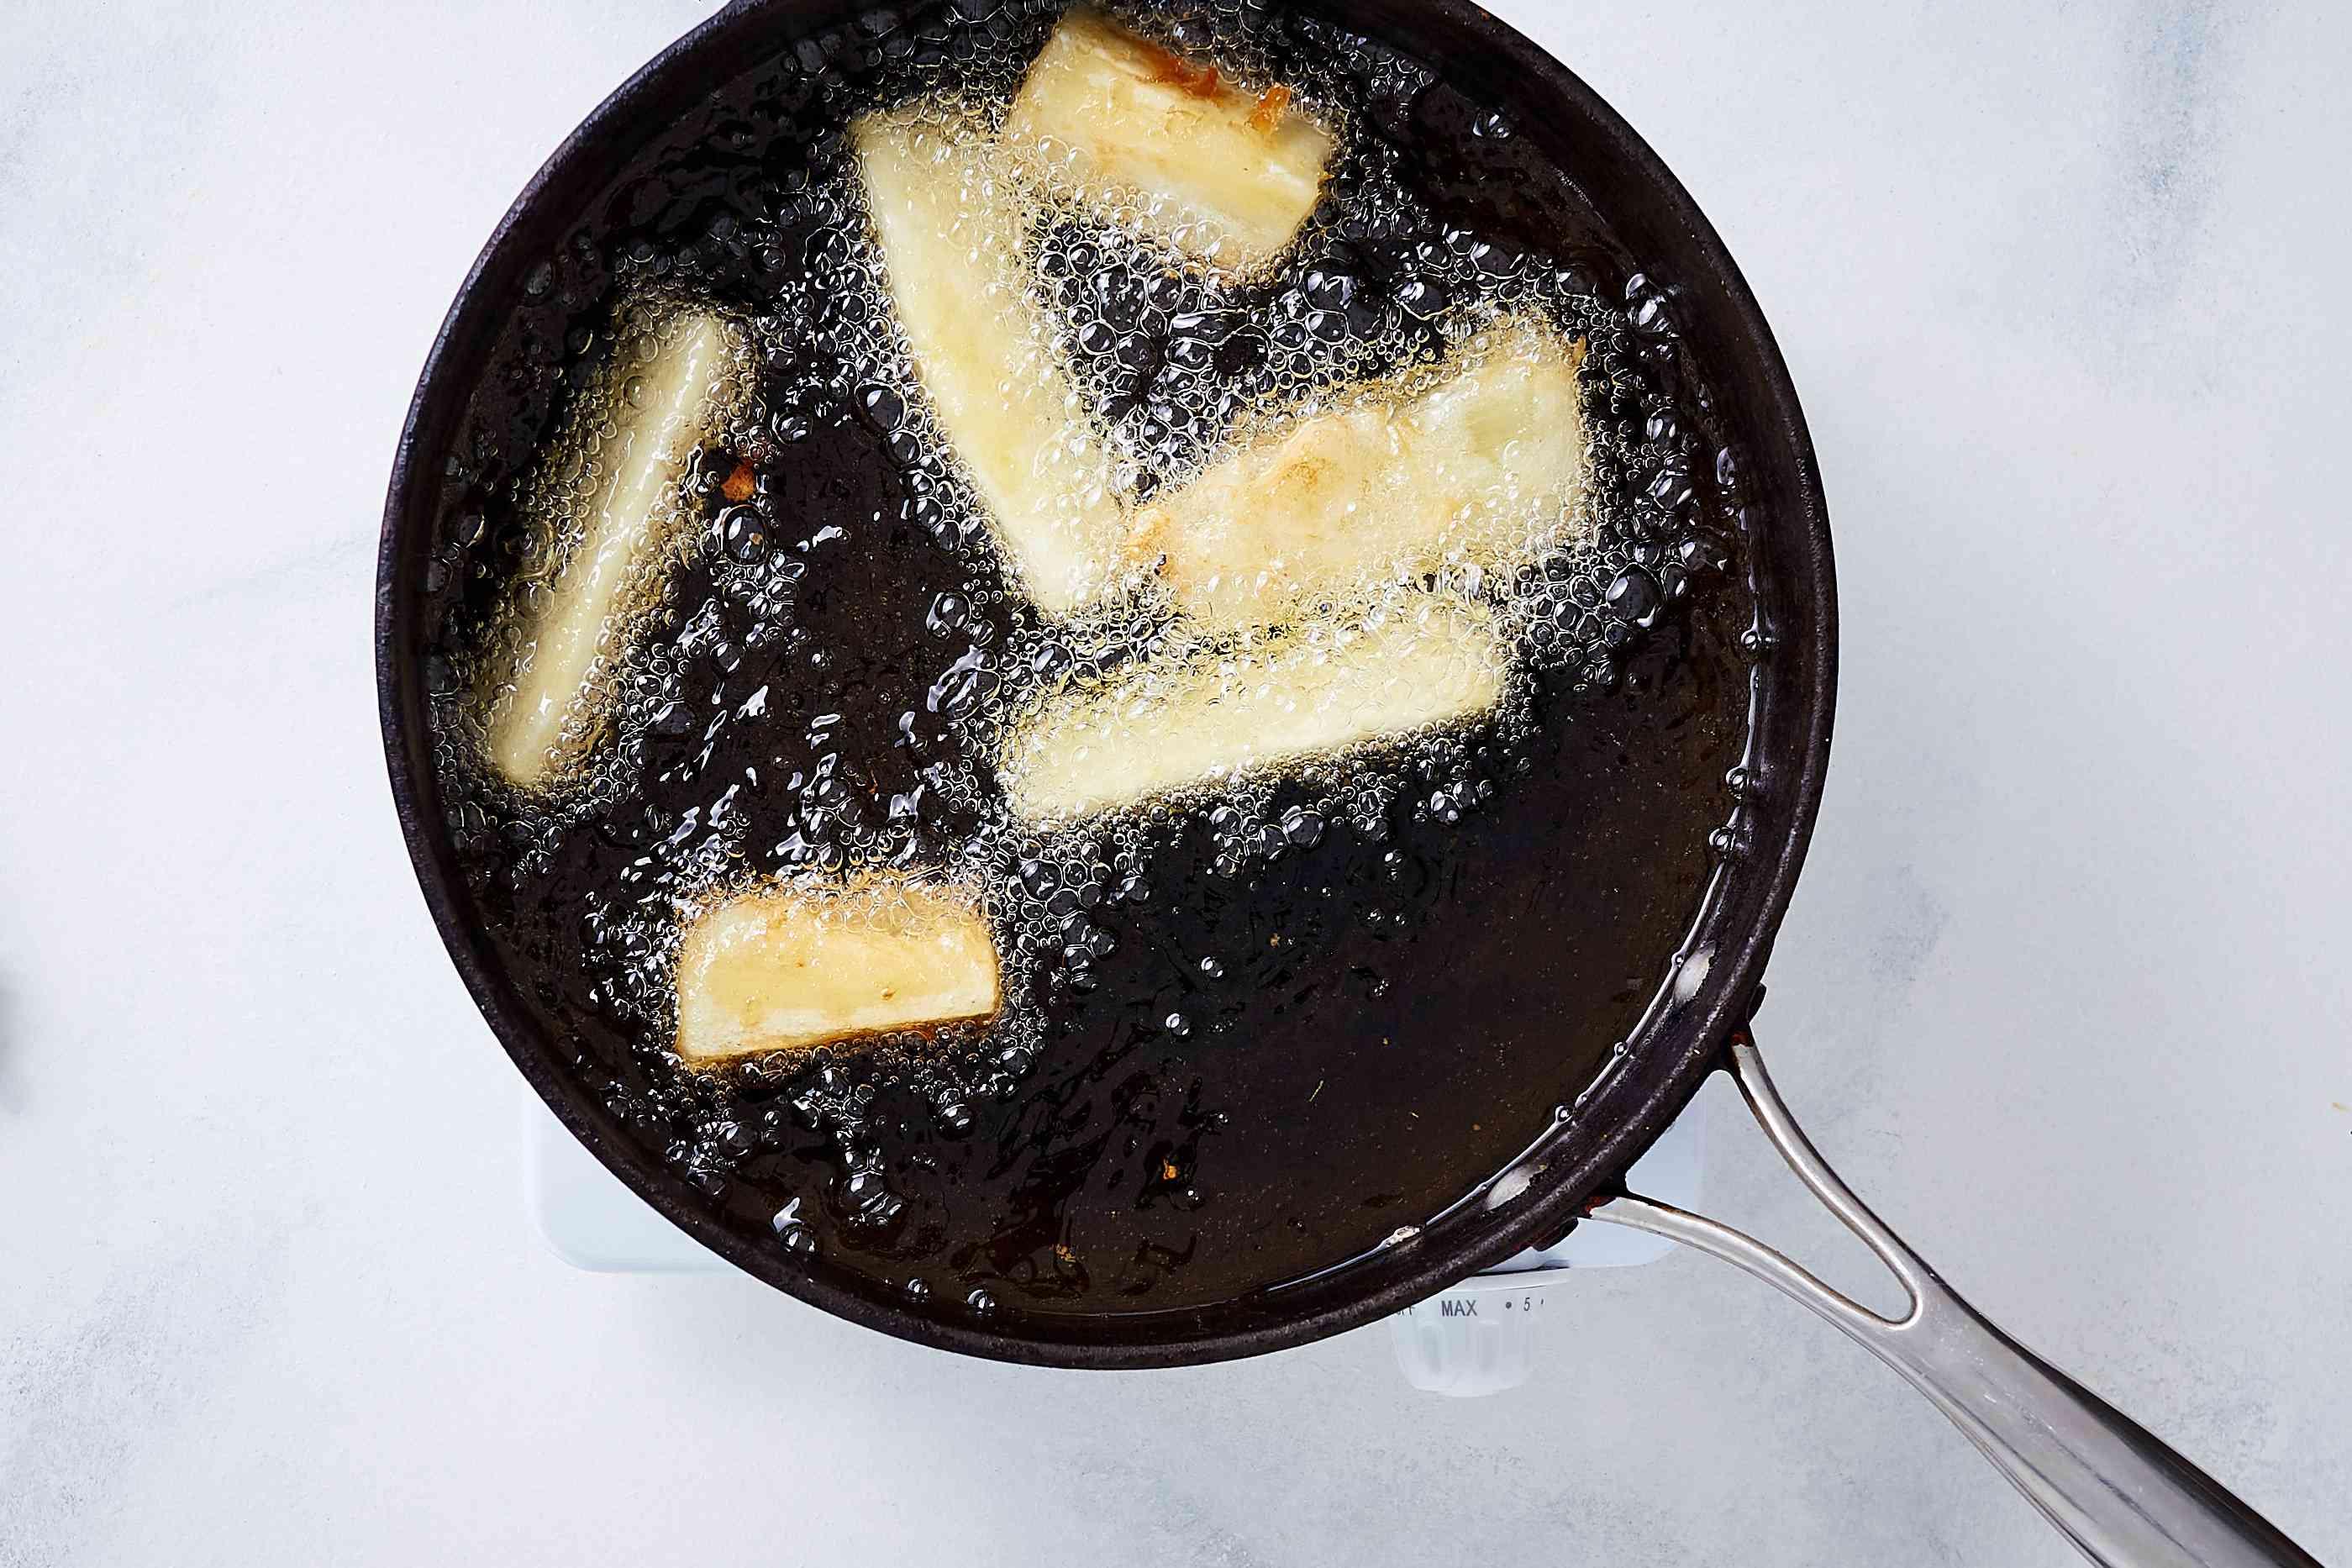 yuca pieces frying in oil